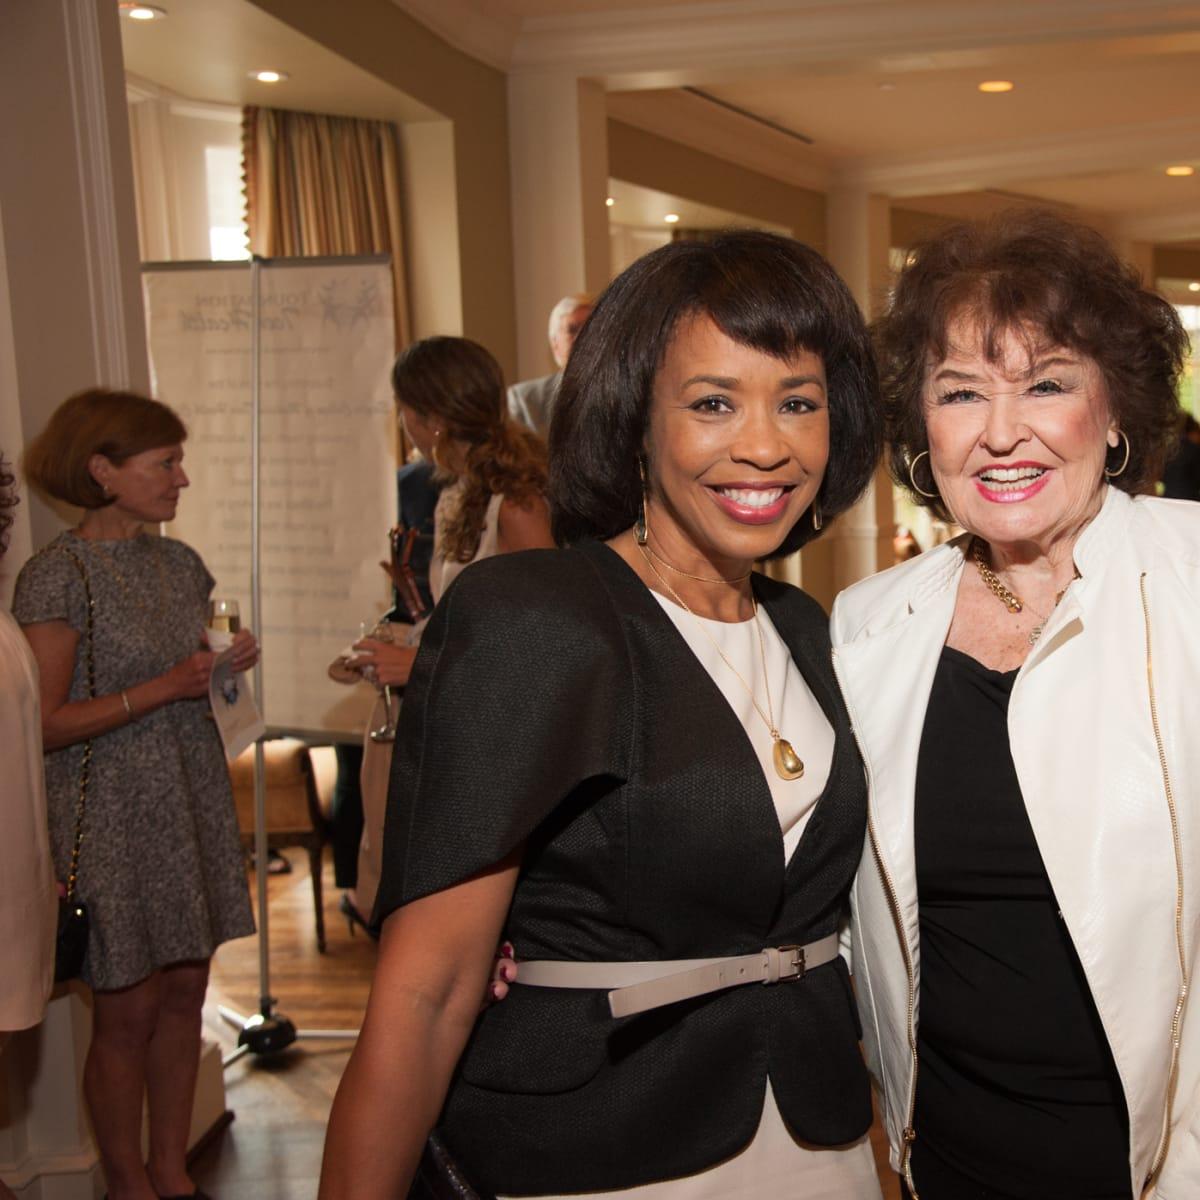 News, shelby, Foundation for Teen Health luncheon, Oct. 2015, Gina Gaston, Warner Roberts